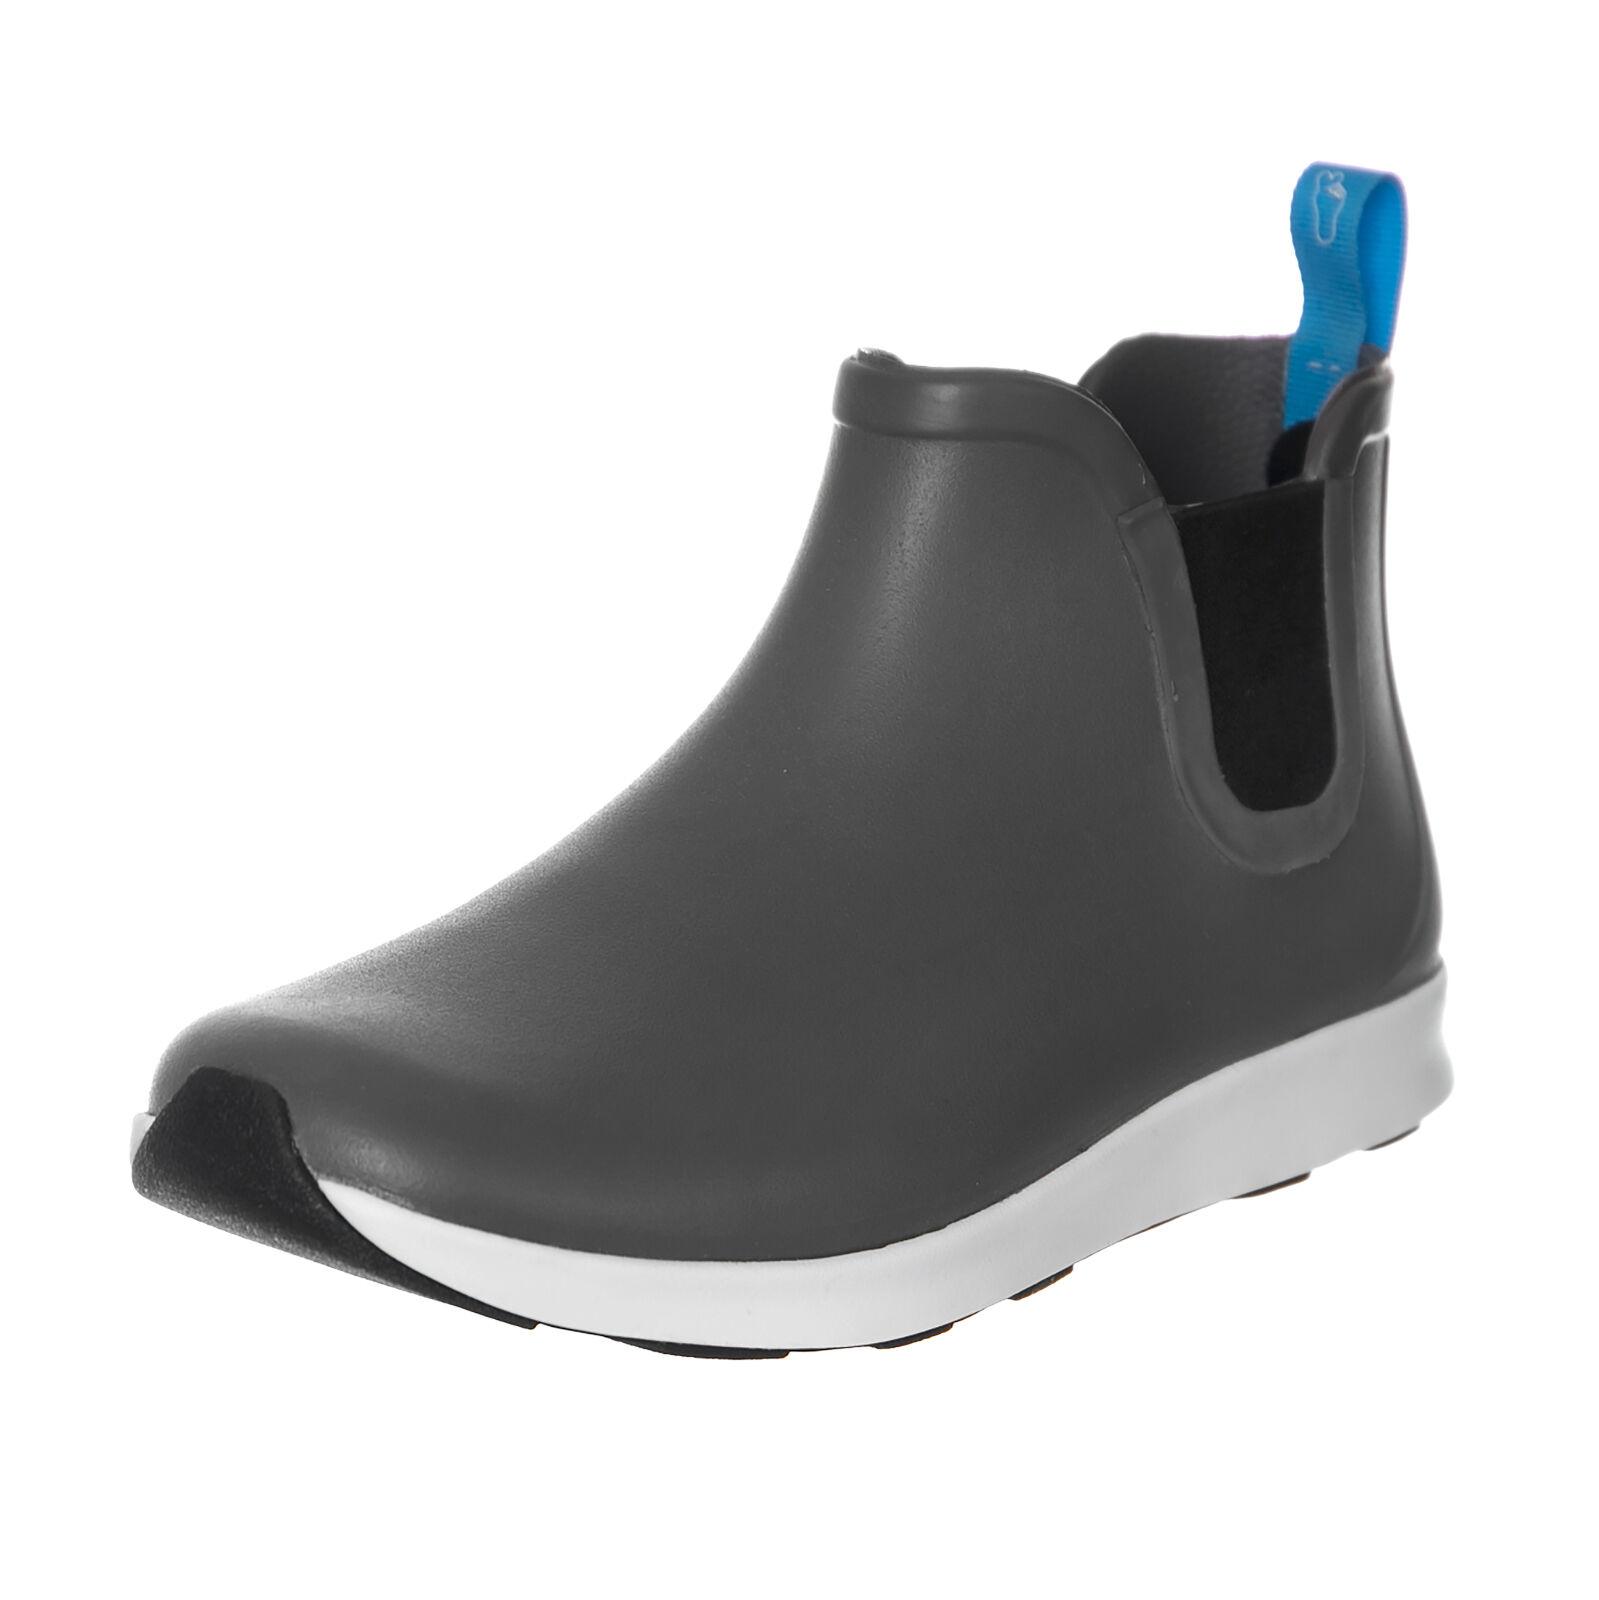 Native Sneakers Ap Rain Dublin Grey Shell White Jiffy Rubber grey